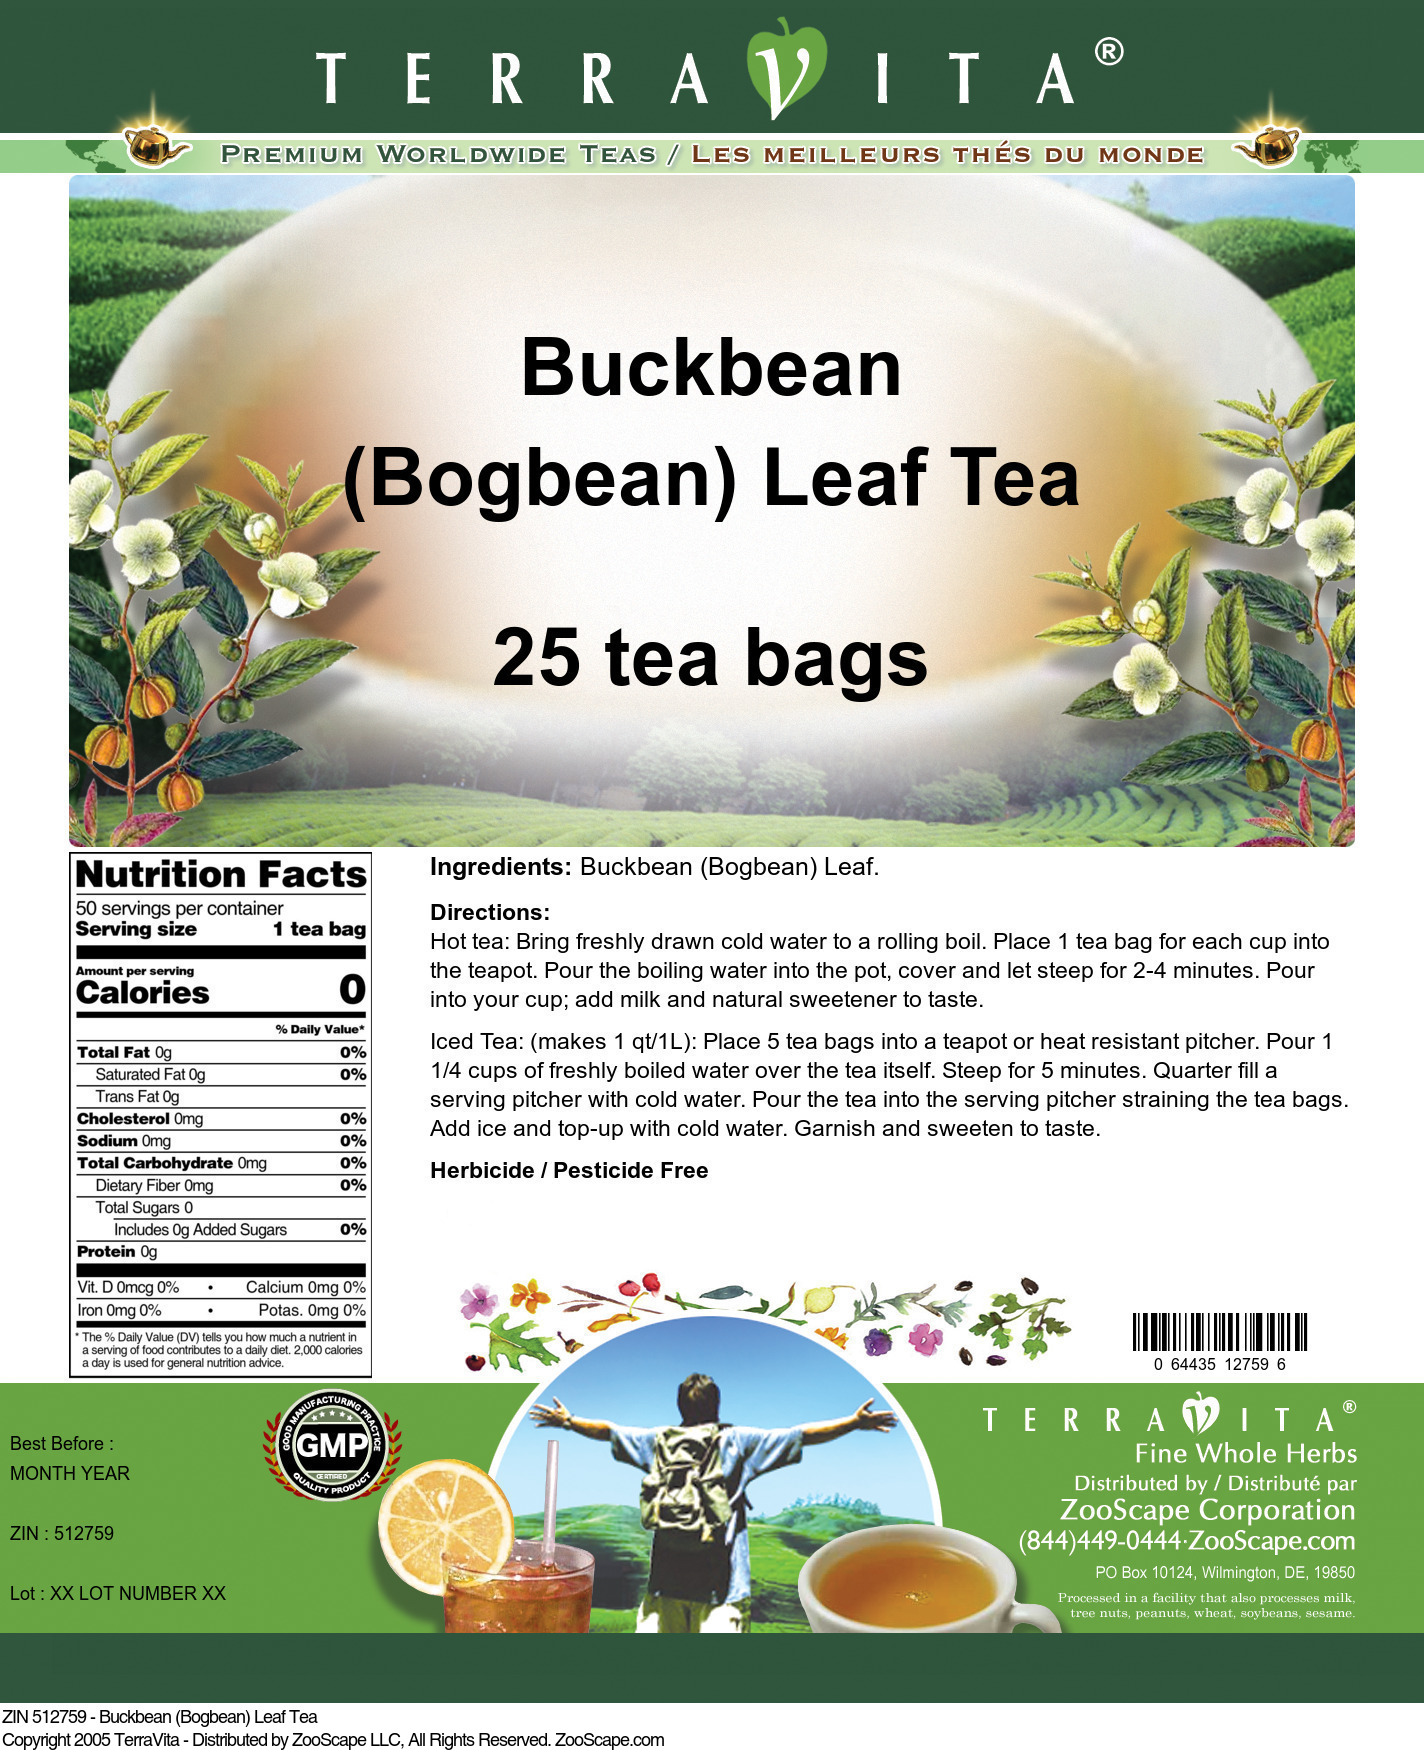 Buckbean (Bogbean) Leaf Tea